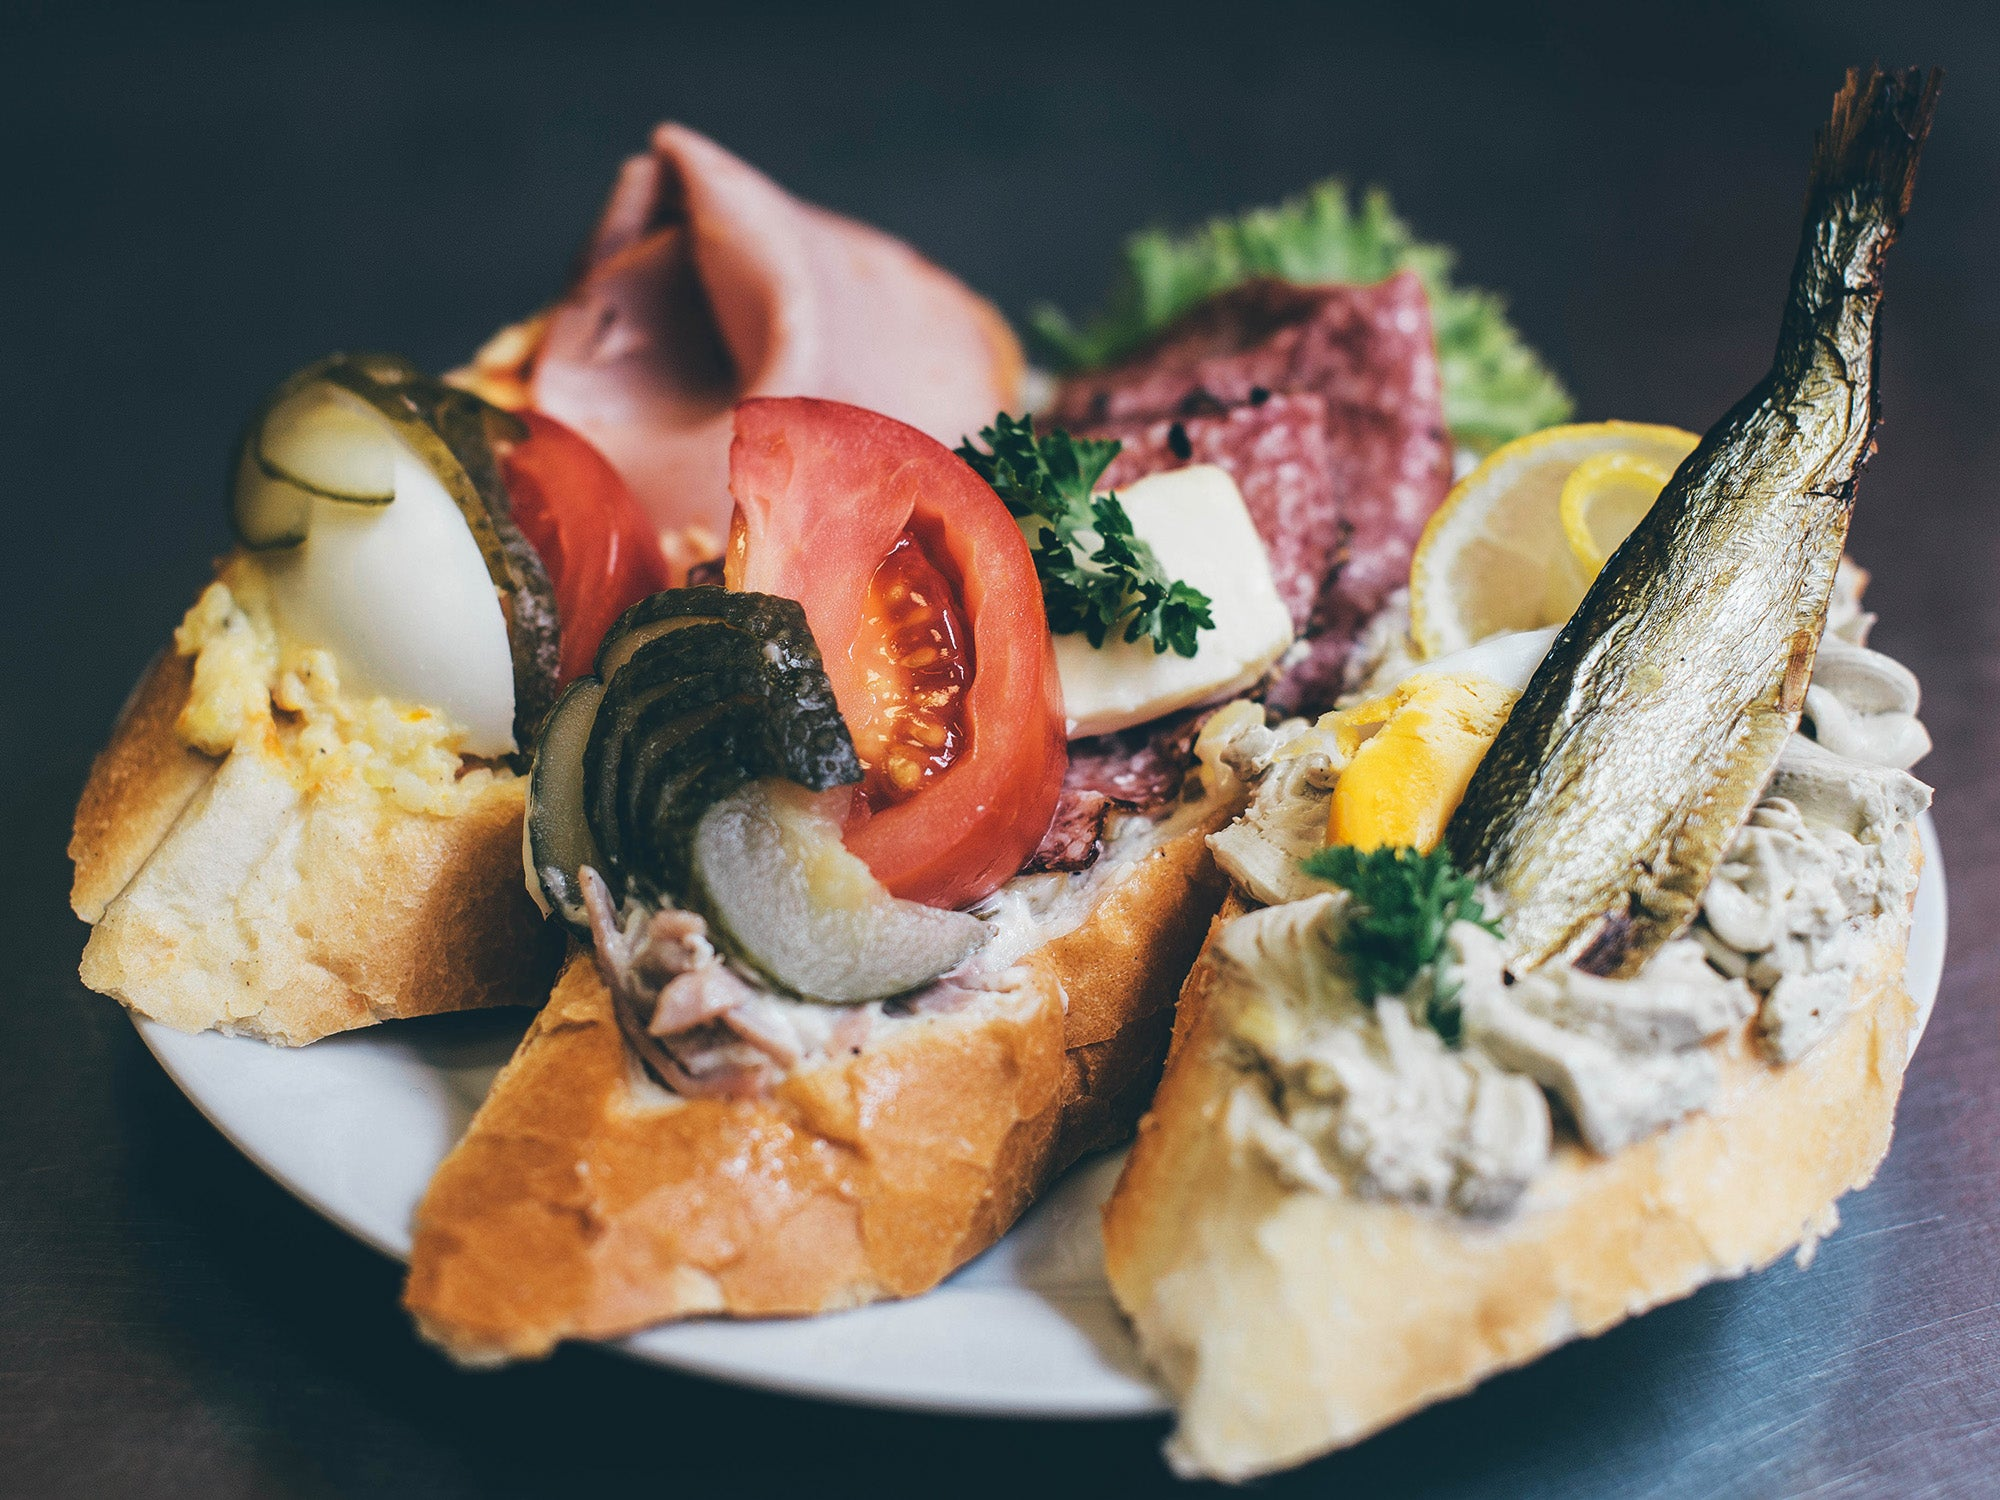 Visit the Century-Old Deli That Makes Prague's Favorite Sandwiches